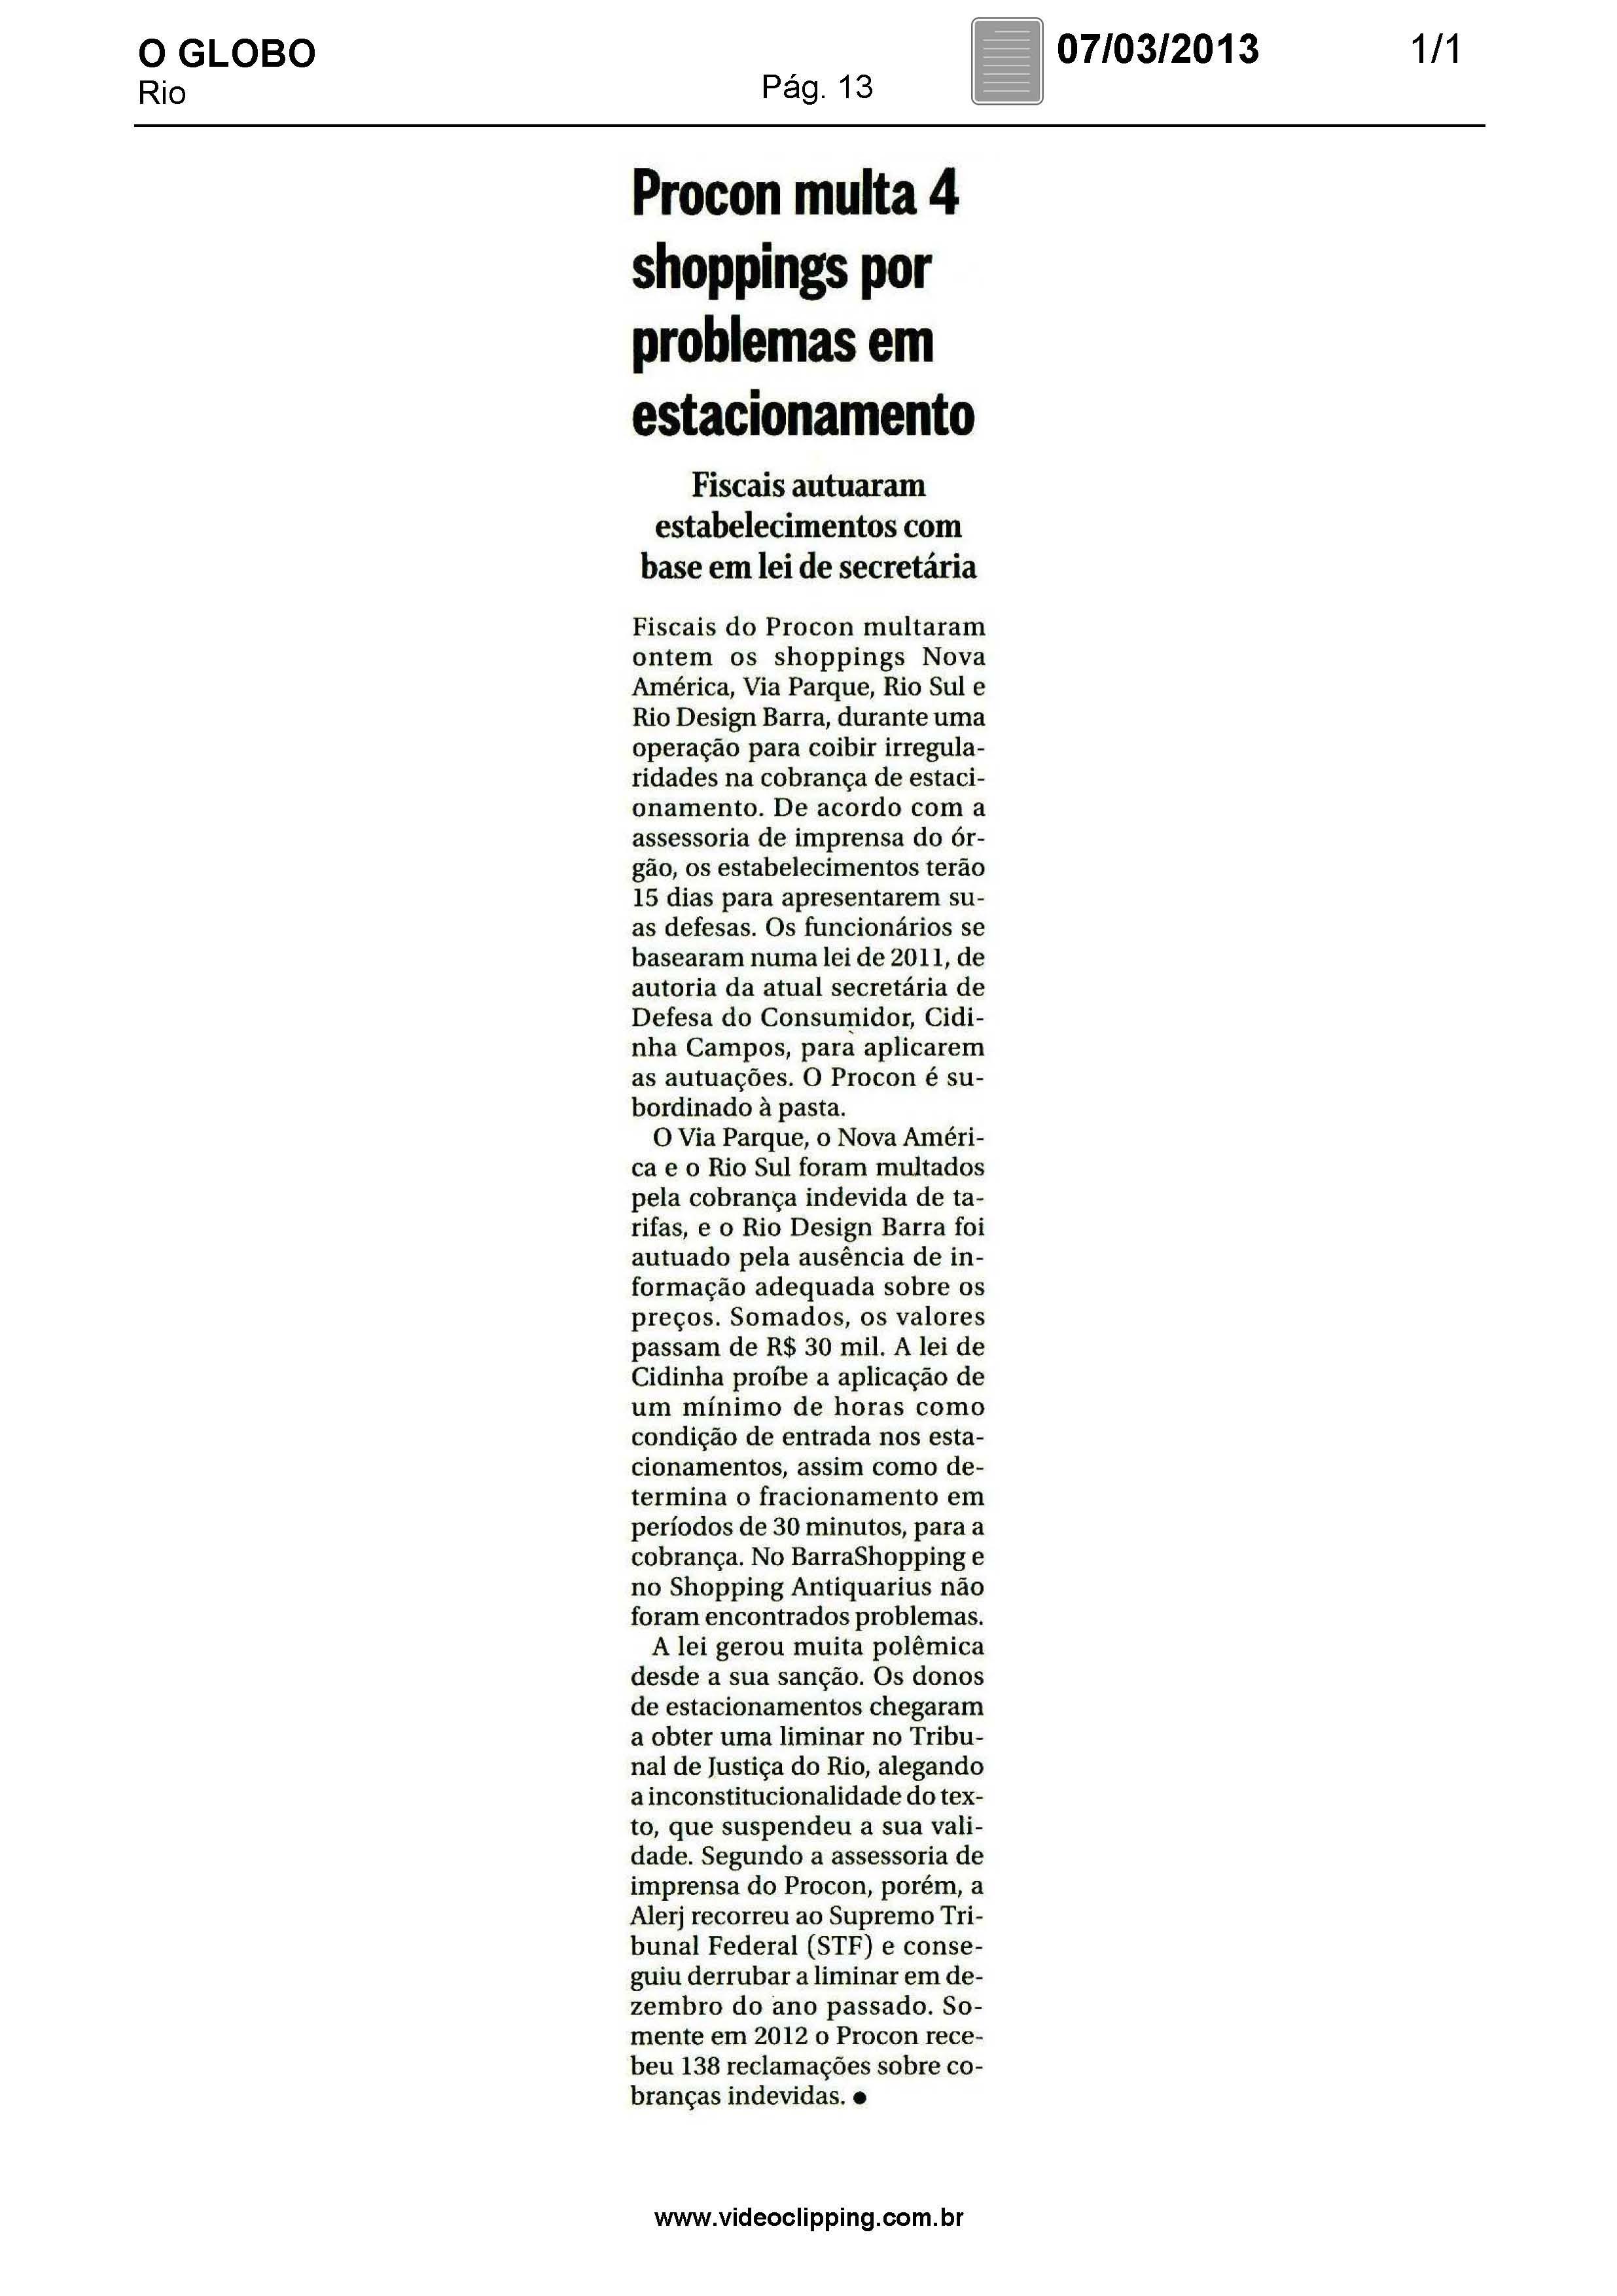 procon_estacionamentos_o_globo_1363112012.99.jpg